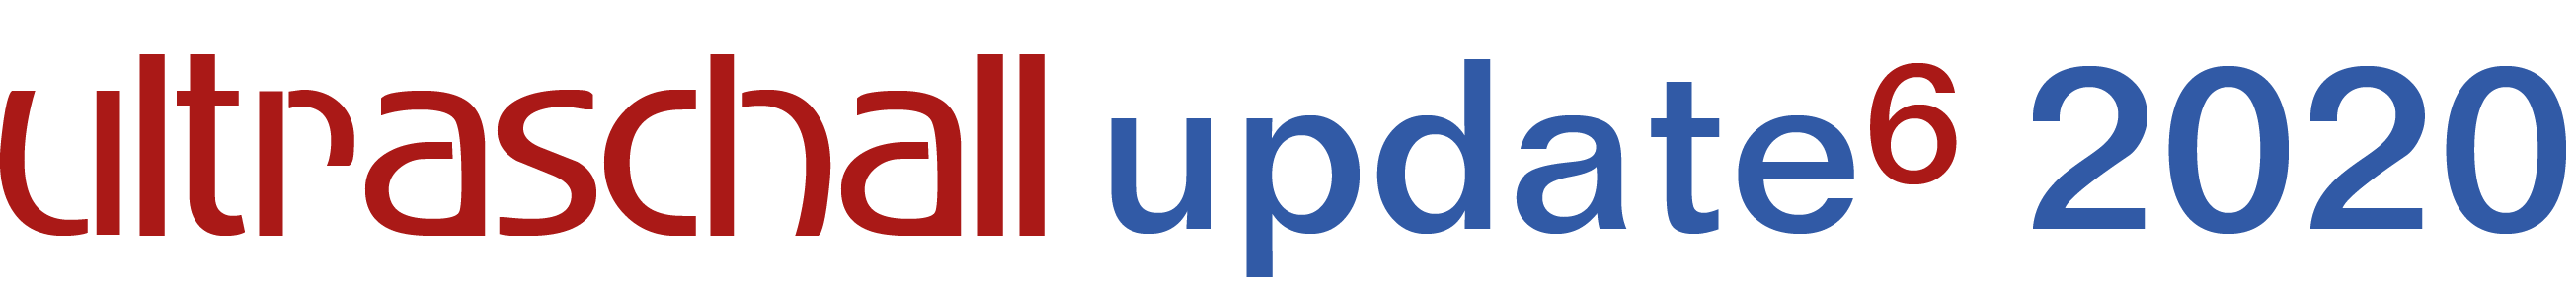 ultraschallupdate Logo